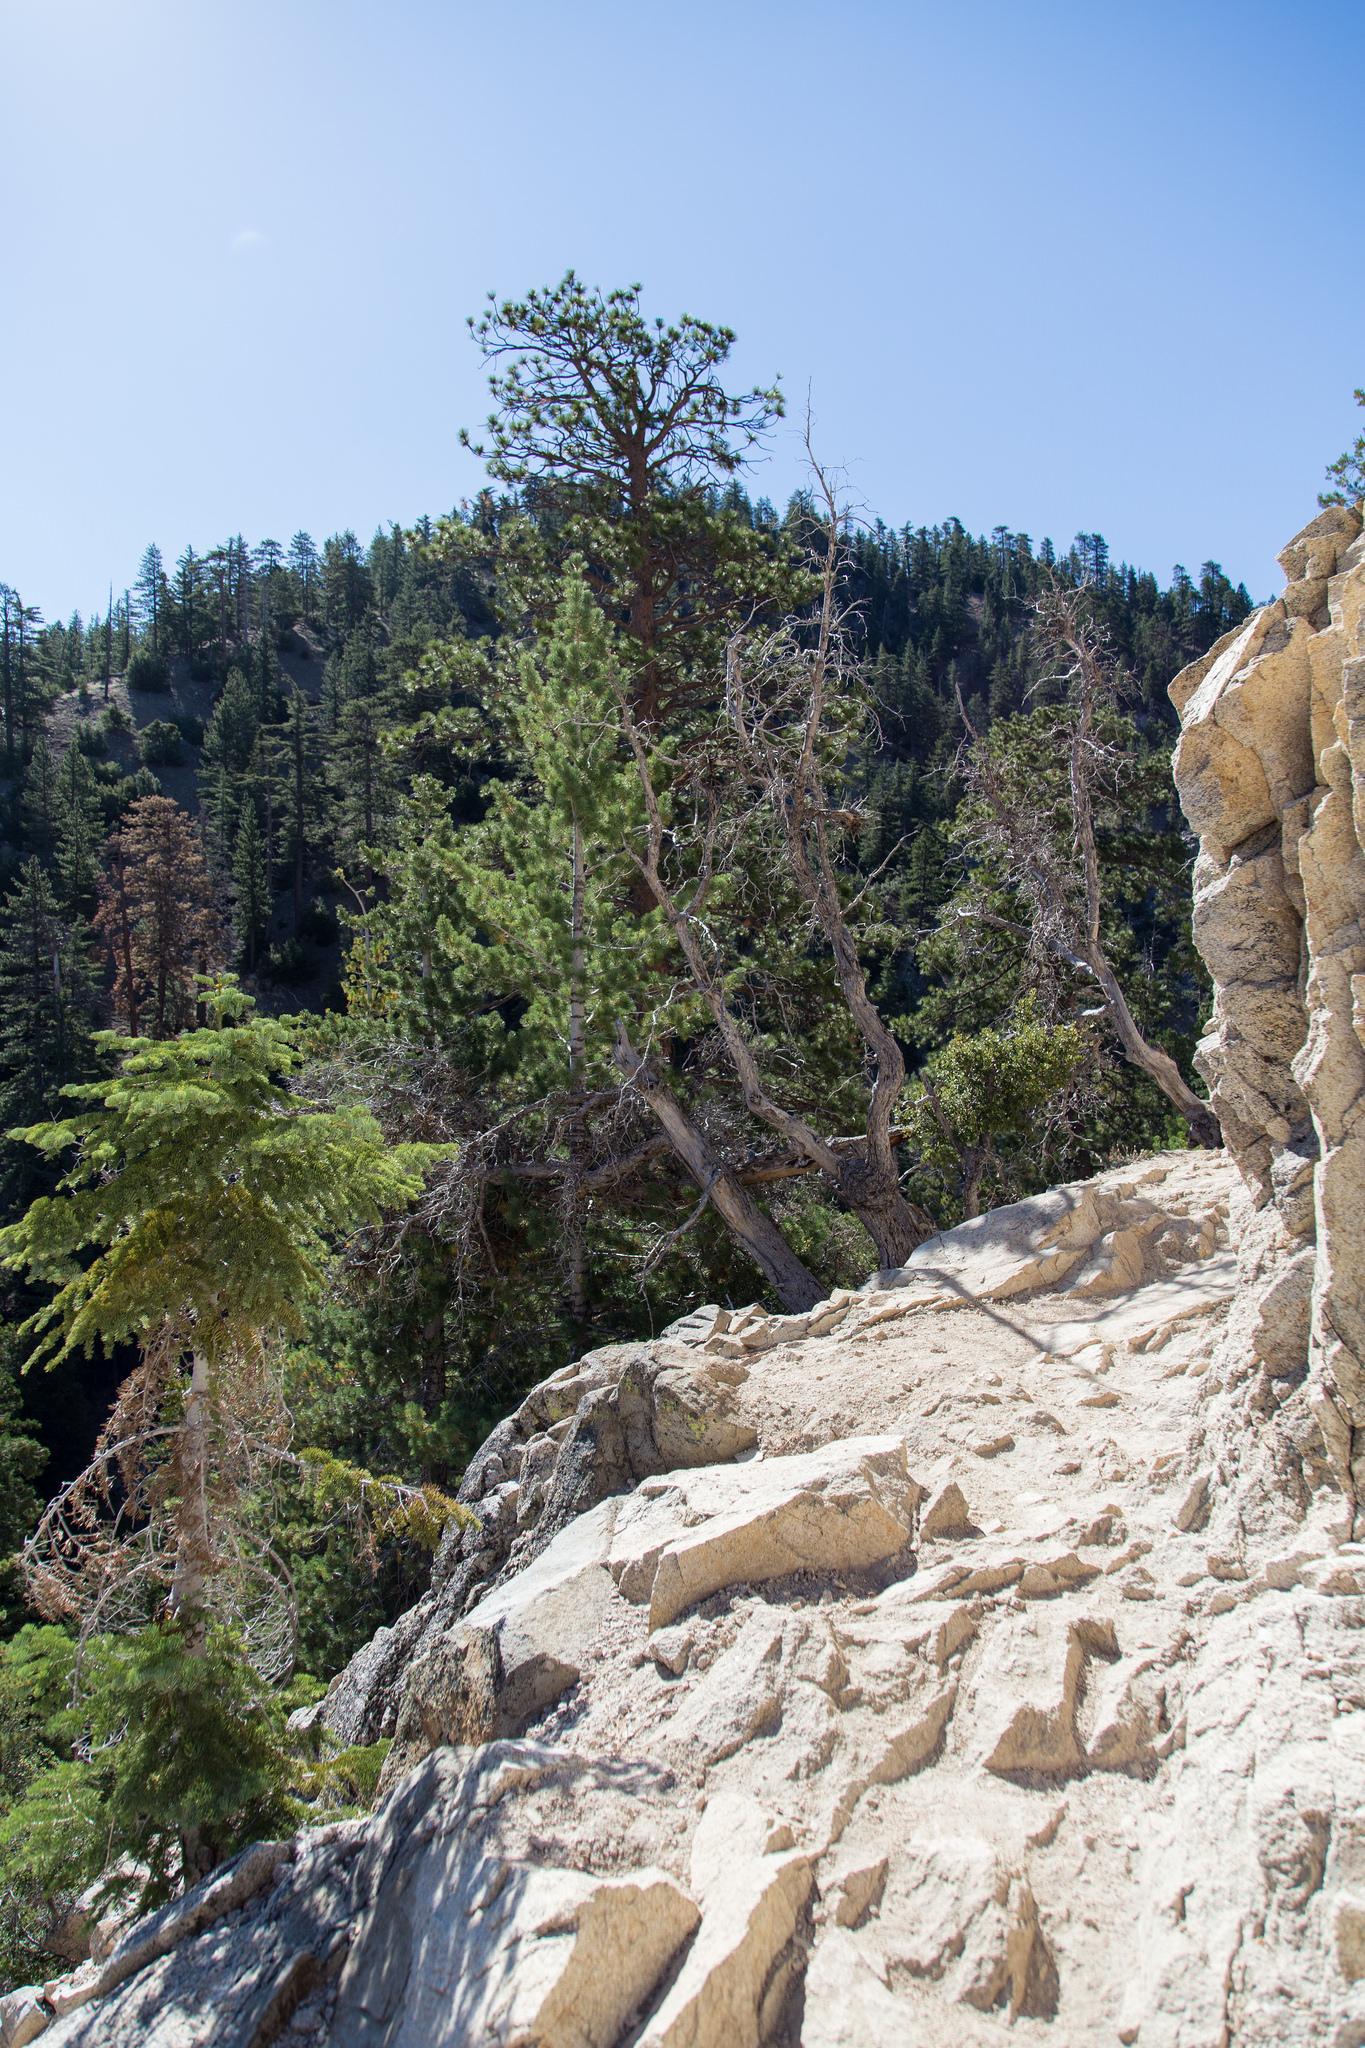 More rocky terrain. Easy to negotiate.